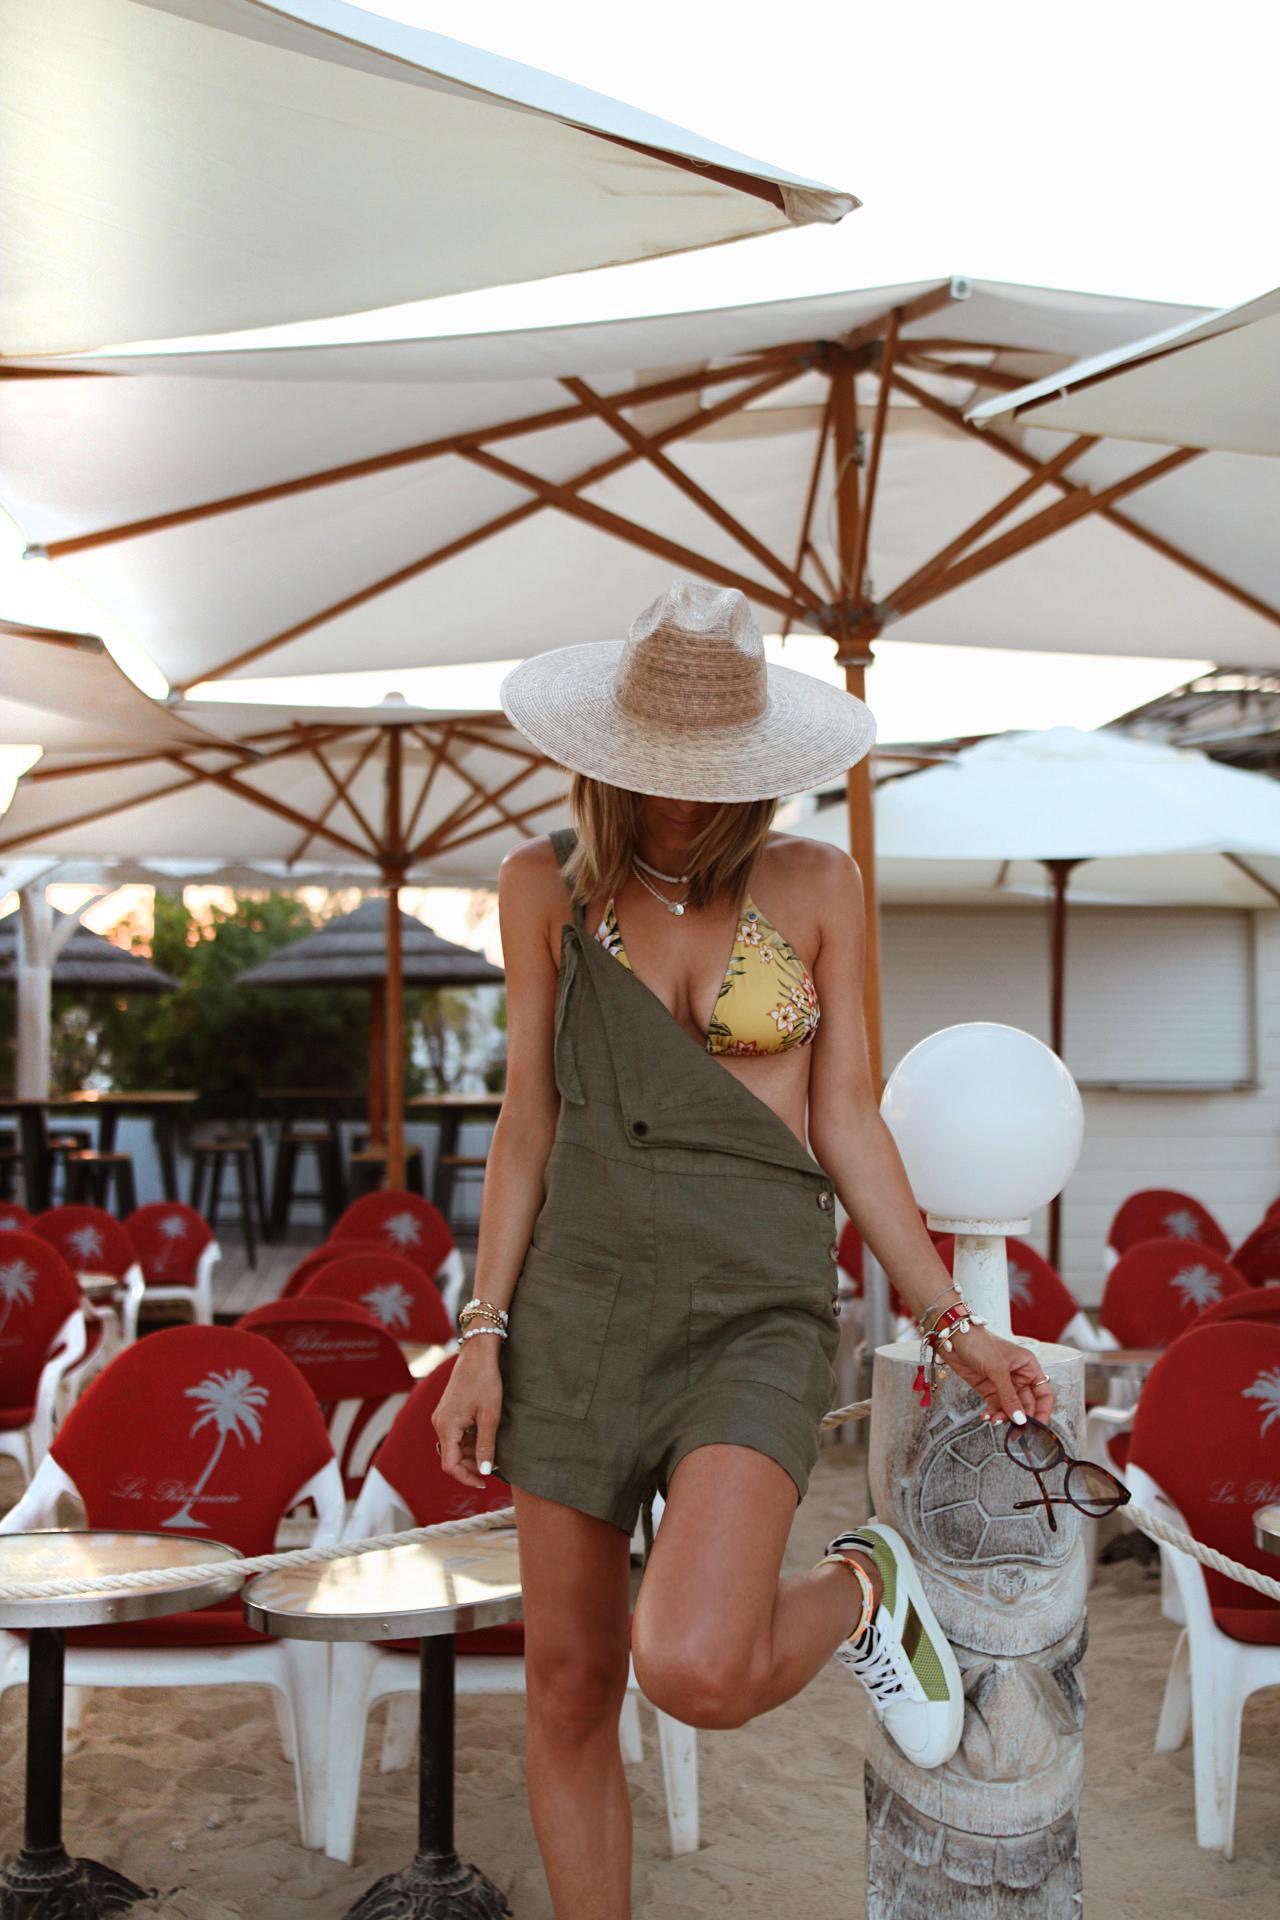 combishort kaki banana moon www.chonandchon.com